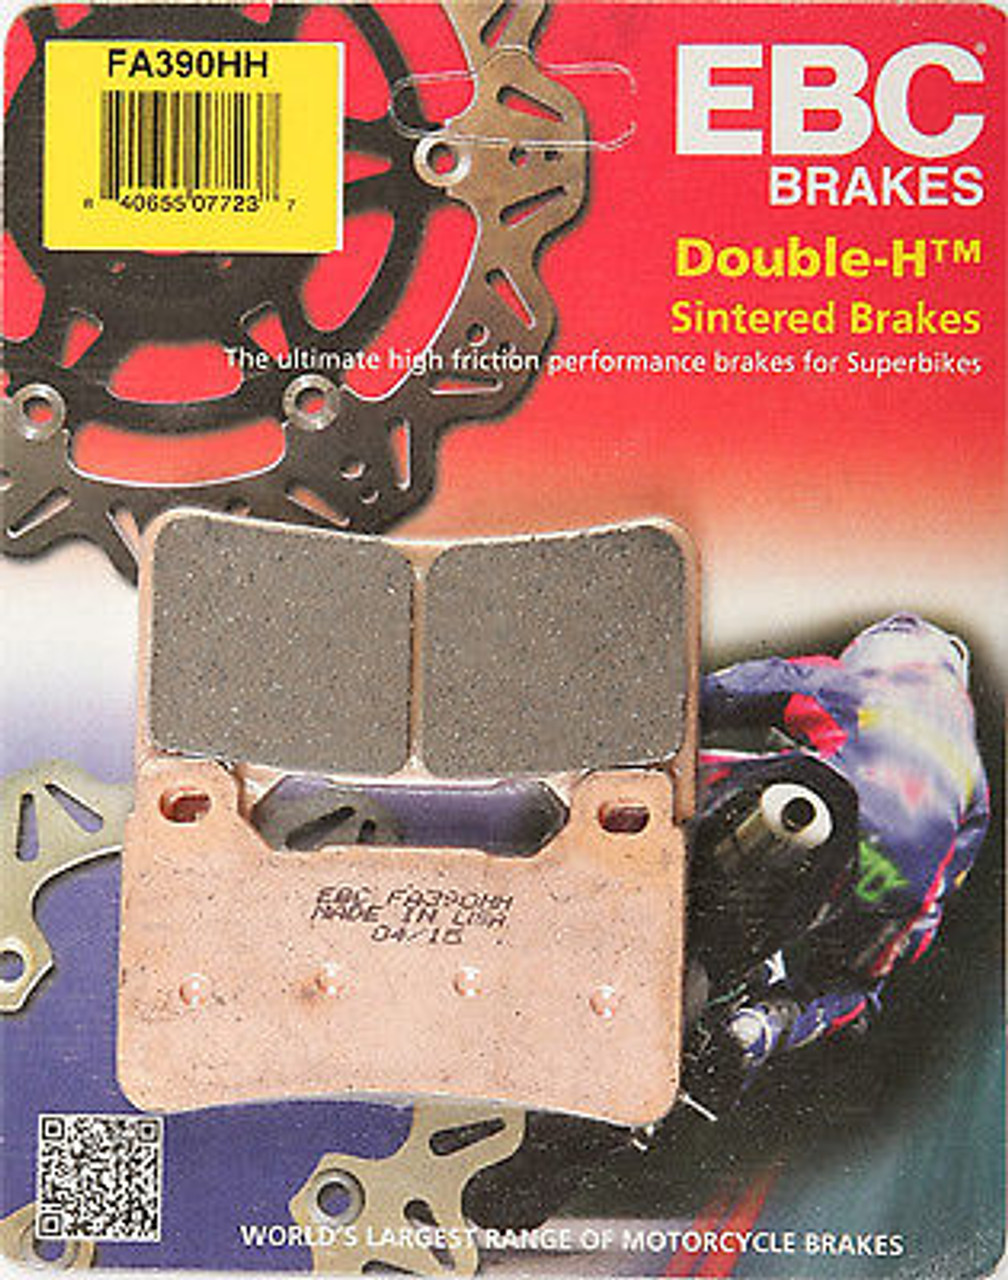 EBC Brakes FA380HH Disc Brake Pad Set